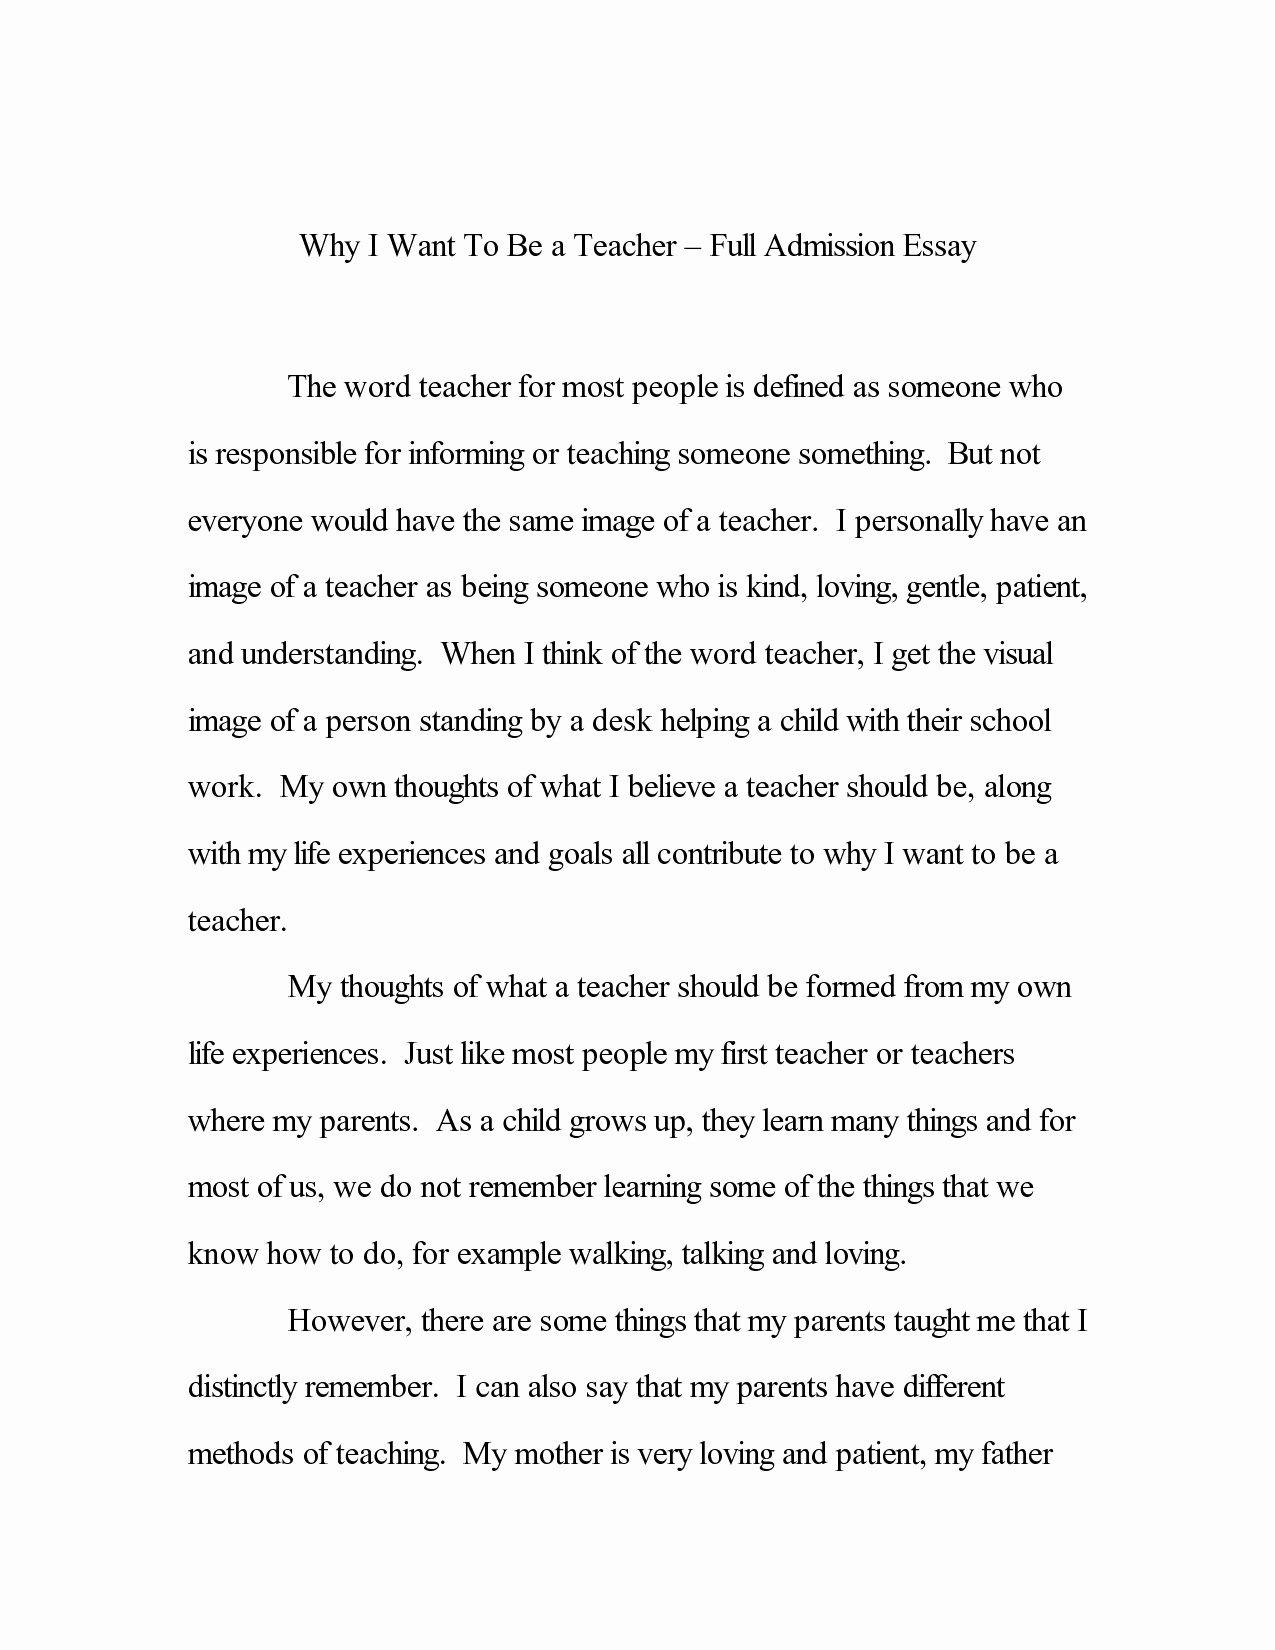 Scholarship Essay Examples 500 Words Best Of Scholarship Essay Examples 500 Words